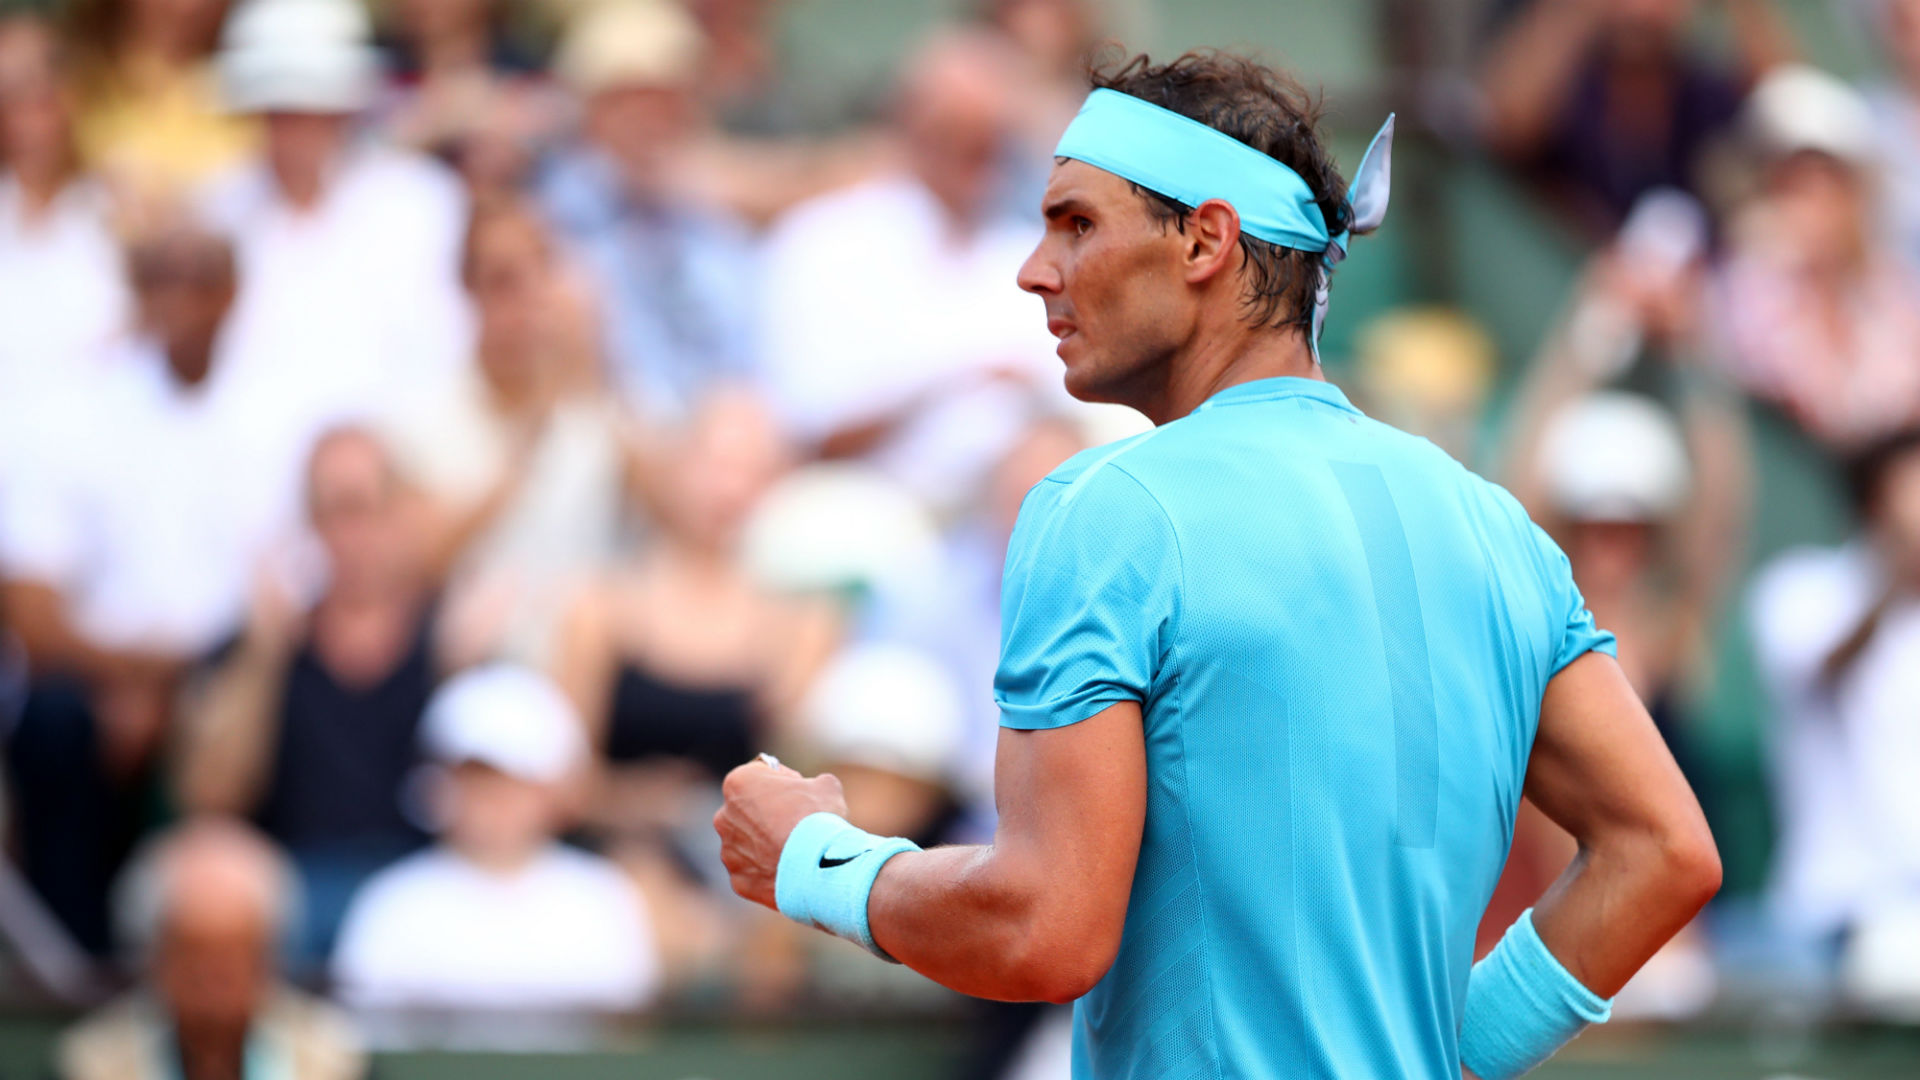 Rafael Nadal News: French Open 2018 Men's Final: Recapping Rafael Nadal's